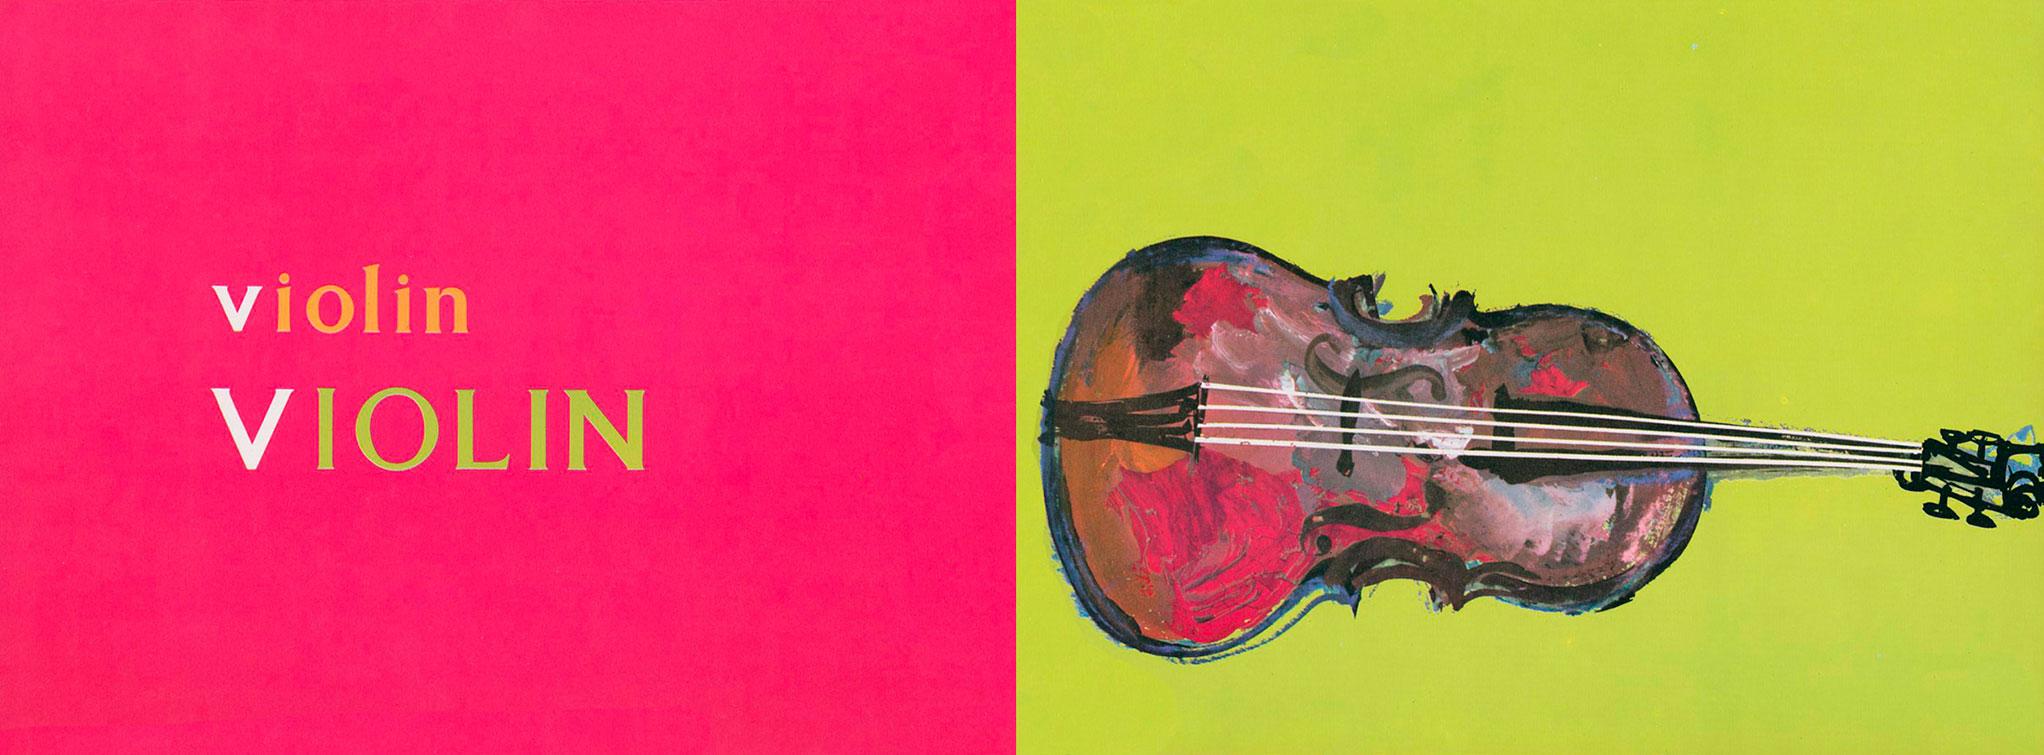 v-for-violin-brian-wildsmith-ABC.jpg